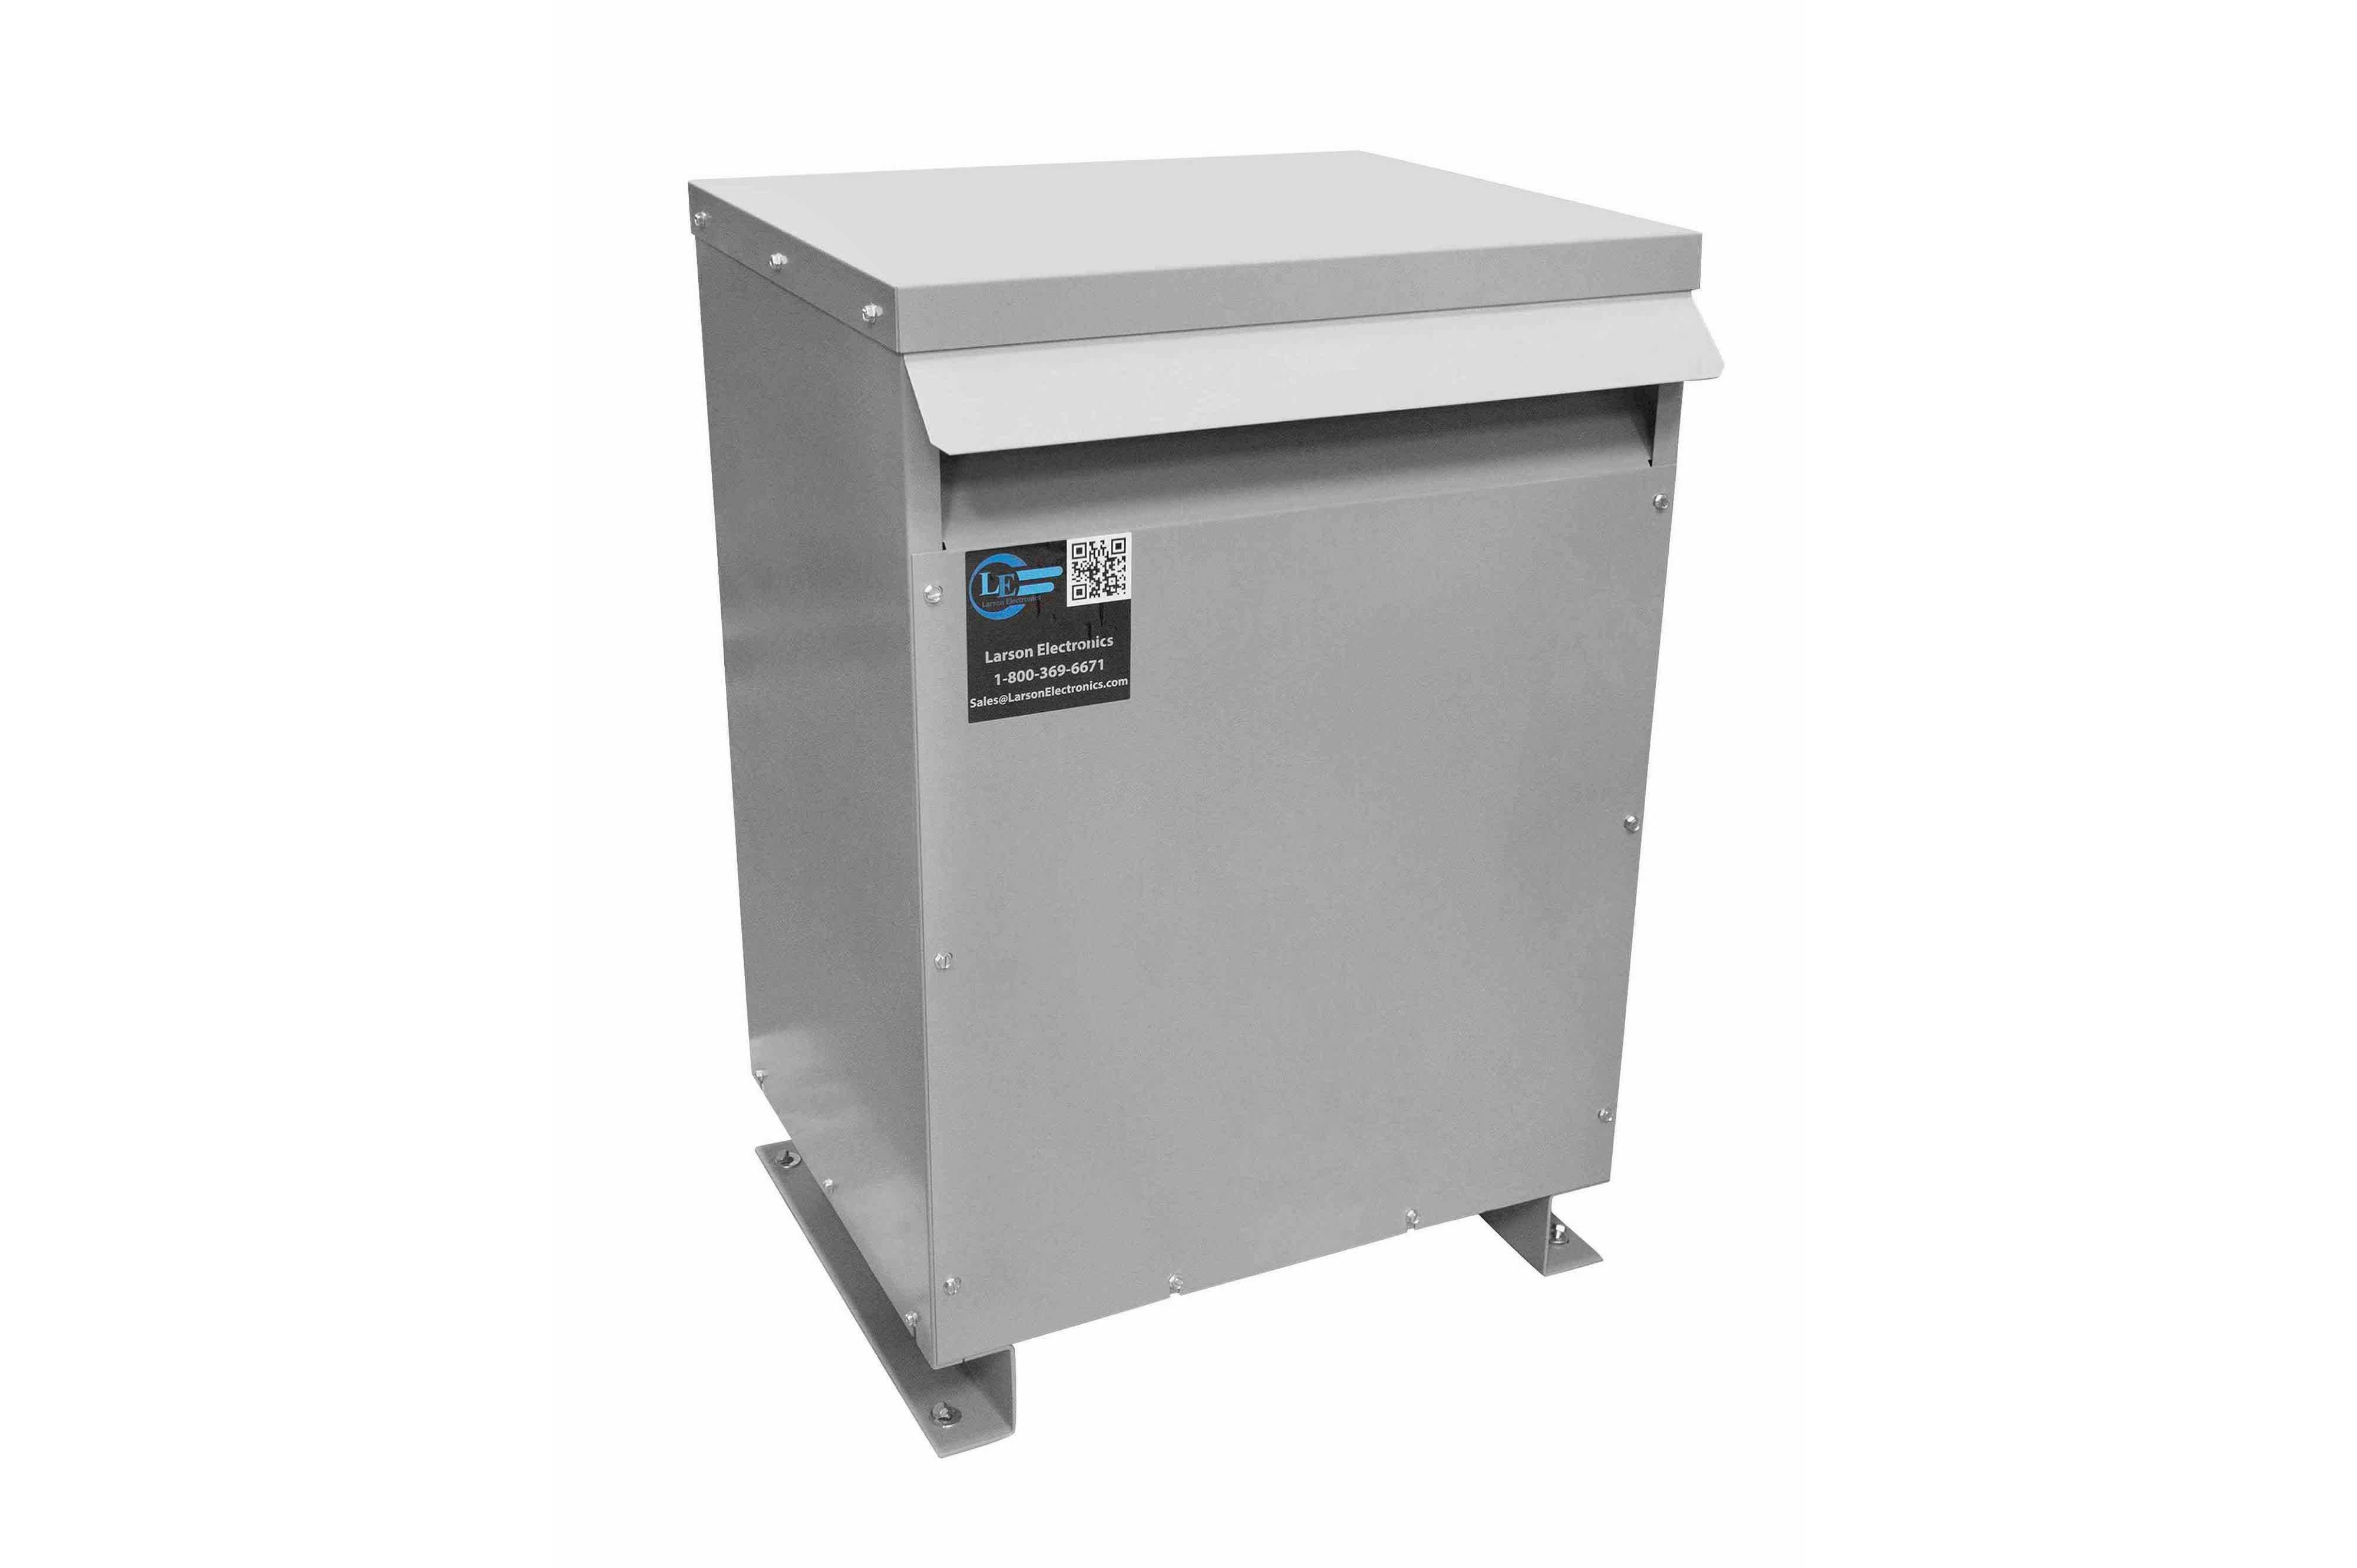 150 kVA 3PH Isolation Transformer, 380V Wye Primary, 240V/120 Delta Secondary, N3R, Ventilated, 60 Hz